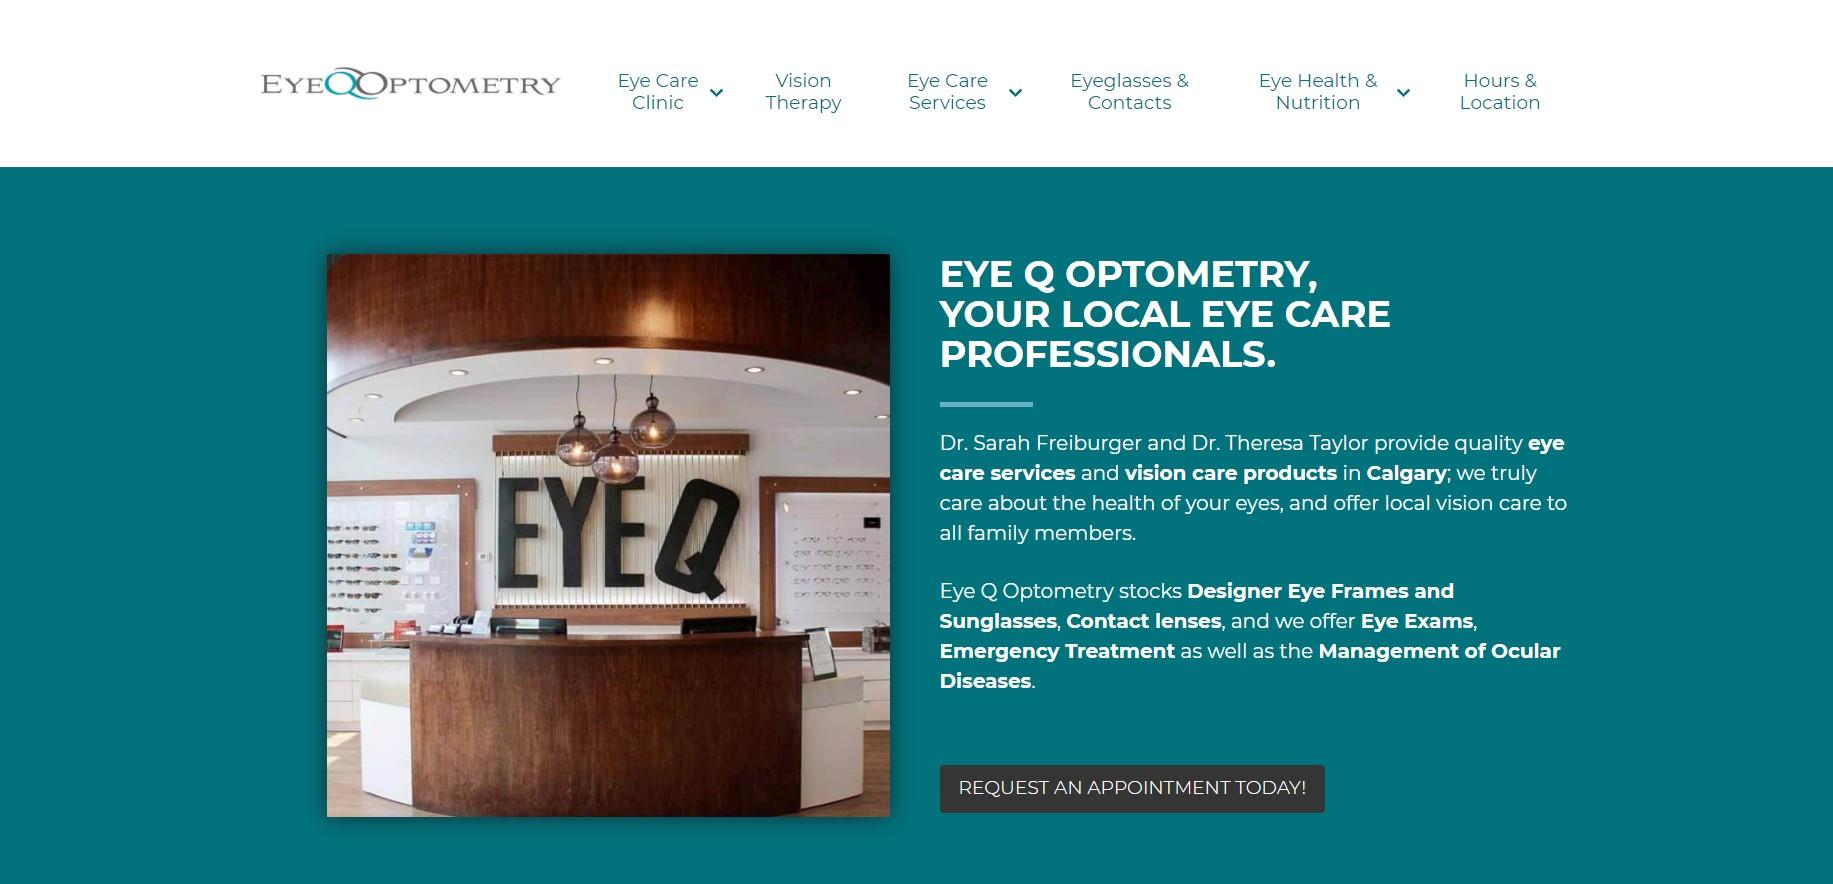 eye q optometrists in calgary